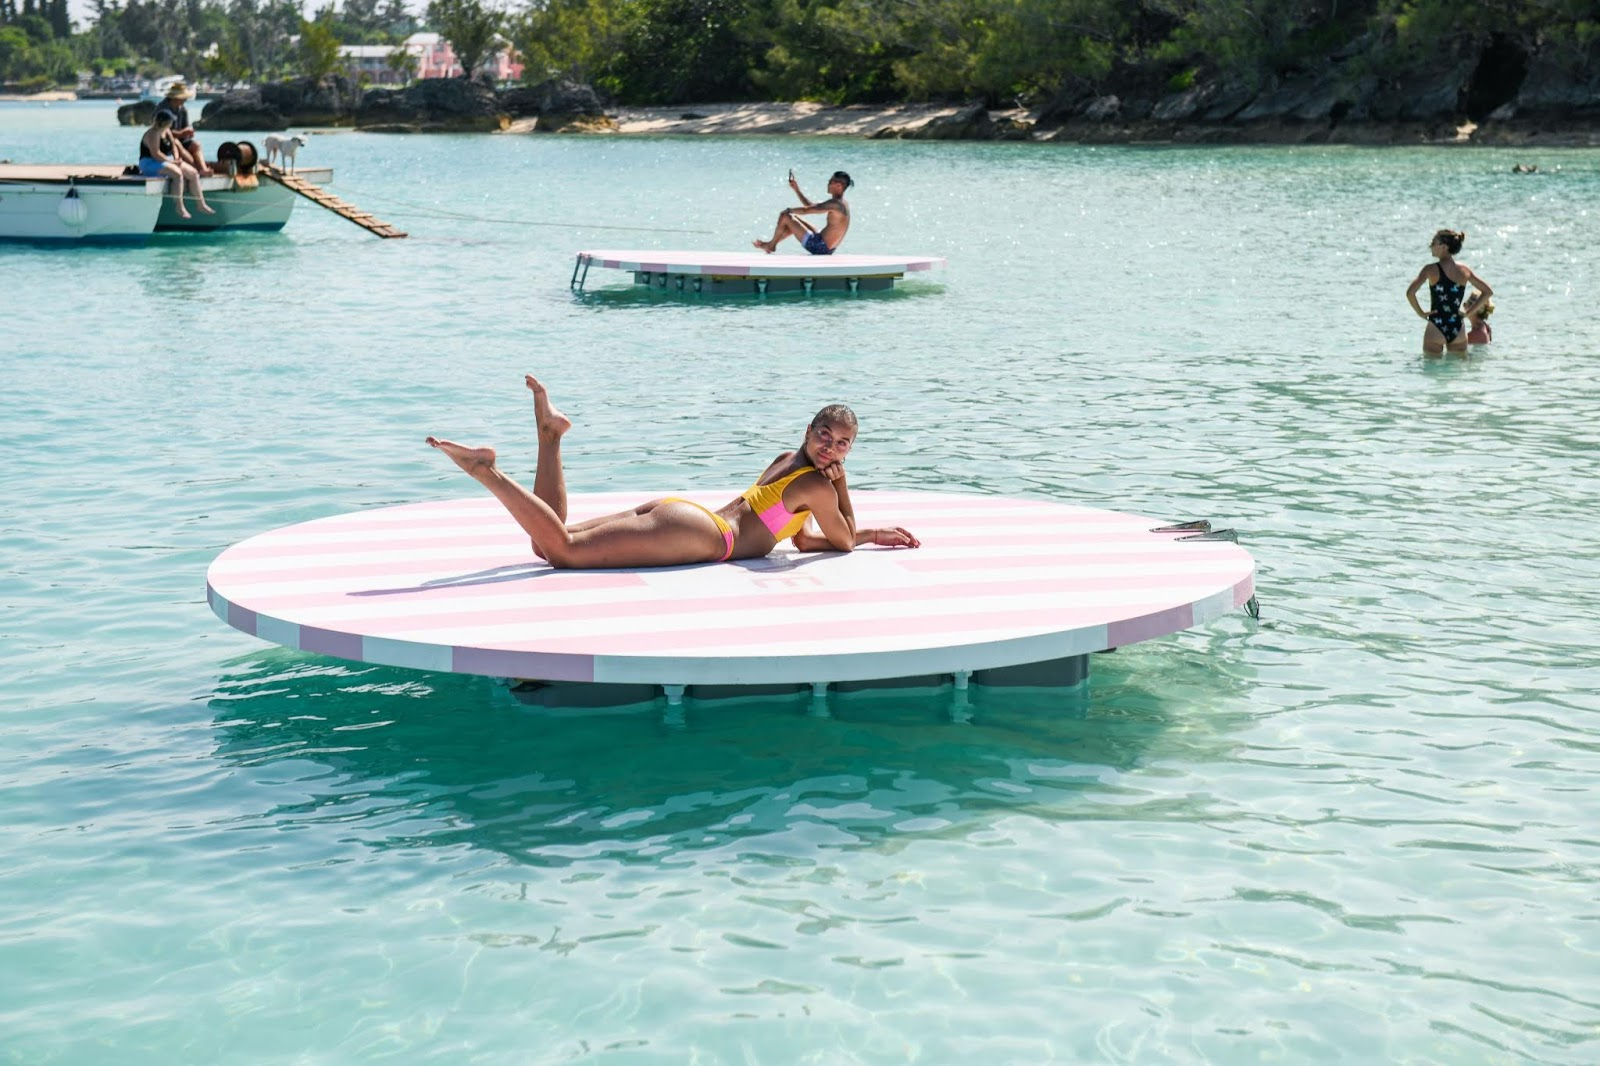 Jasmine-Sanders-in-bikinis-during-Revolve-Summer-Event-in-Bermuda-76qm2xhhdo.jpg